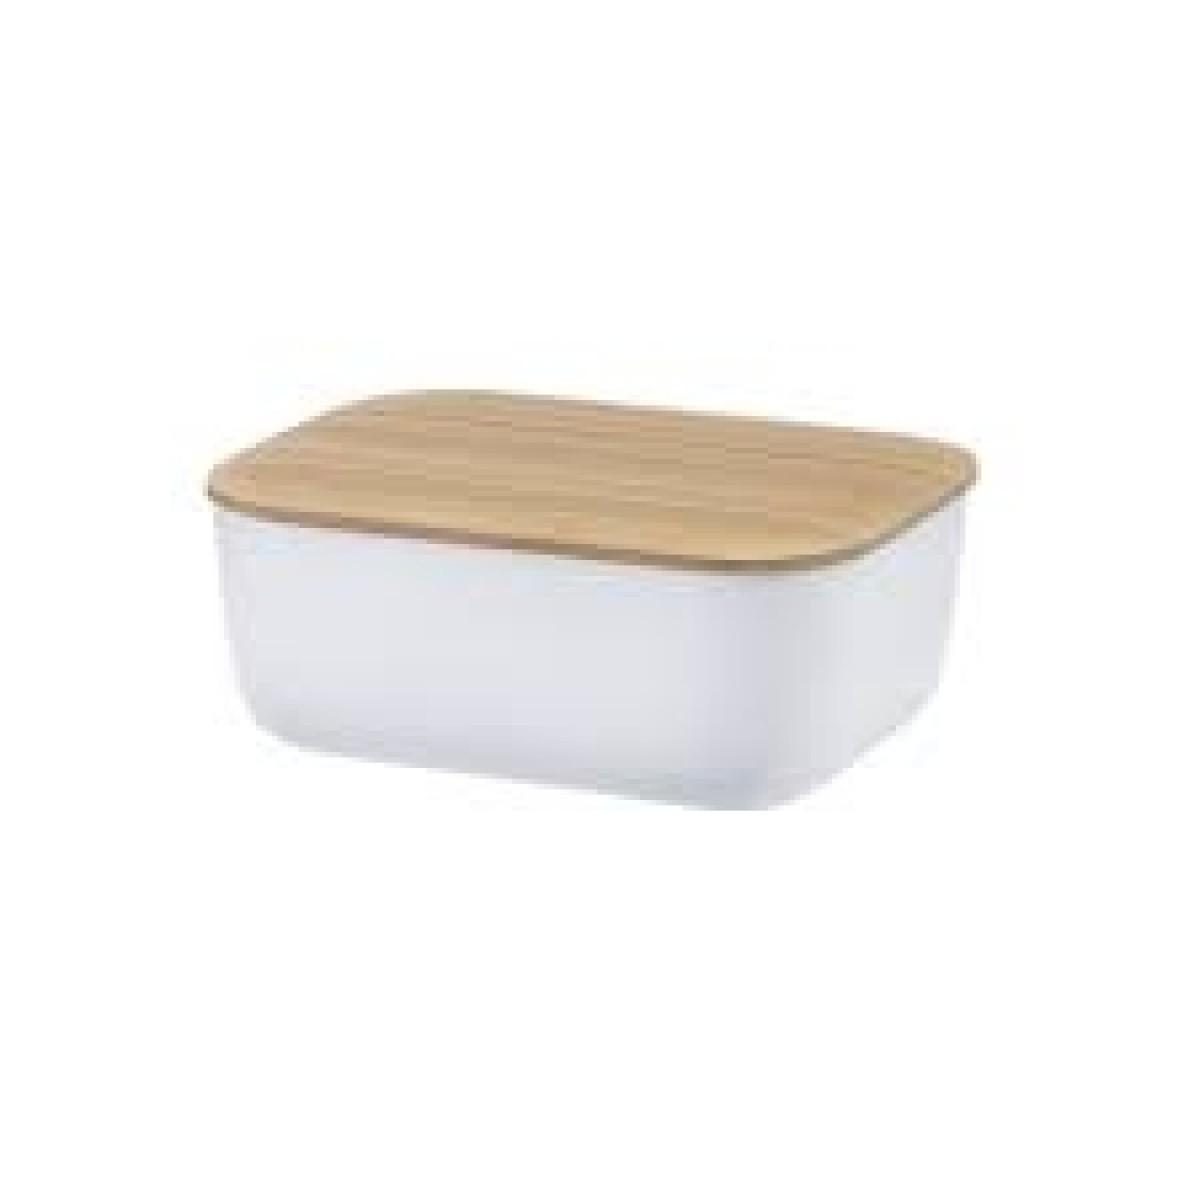 STELTON RIG-TIG Smørboks box-it - hvid